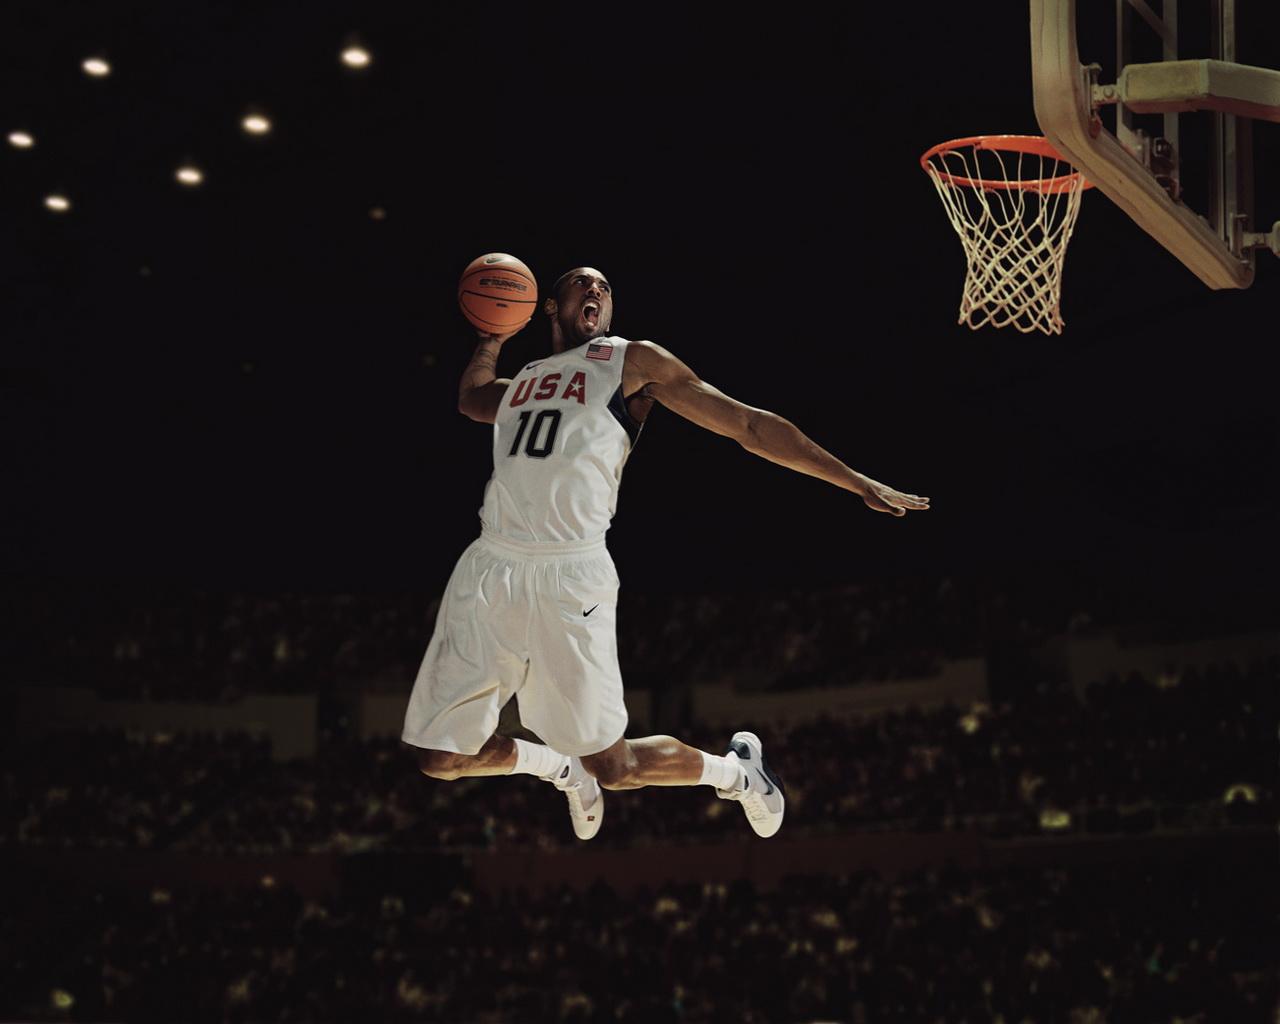 Kobe Bryant Wallpaper Dunk 18 1280x1024